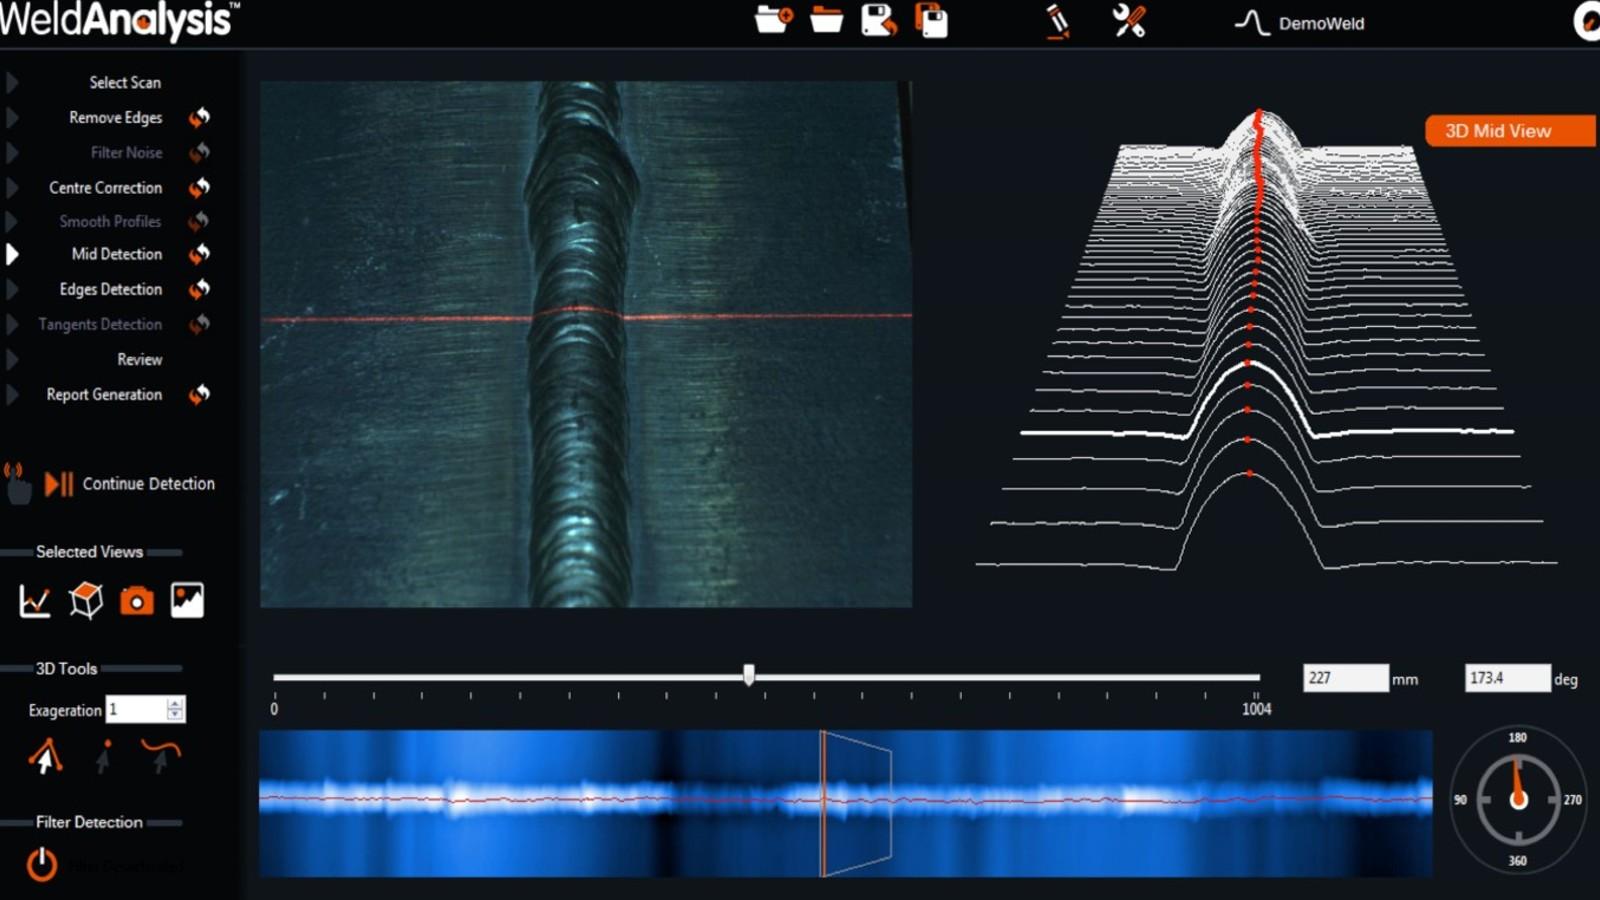 WeldAnalysis screenshot.jpg